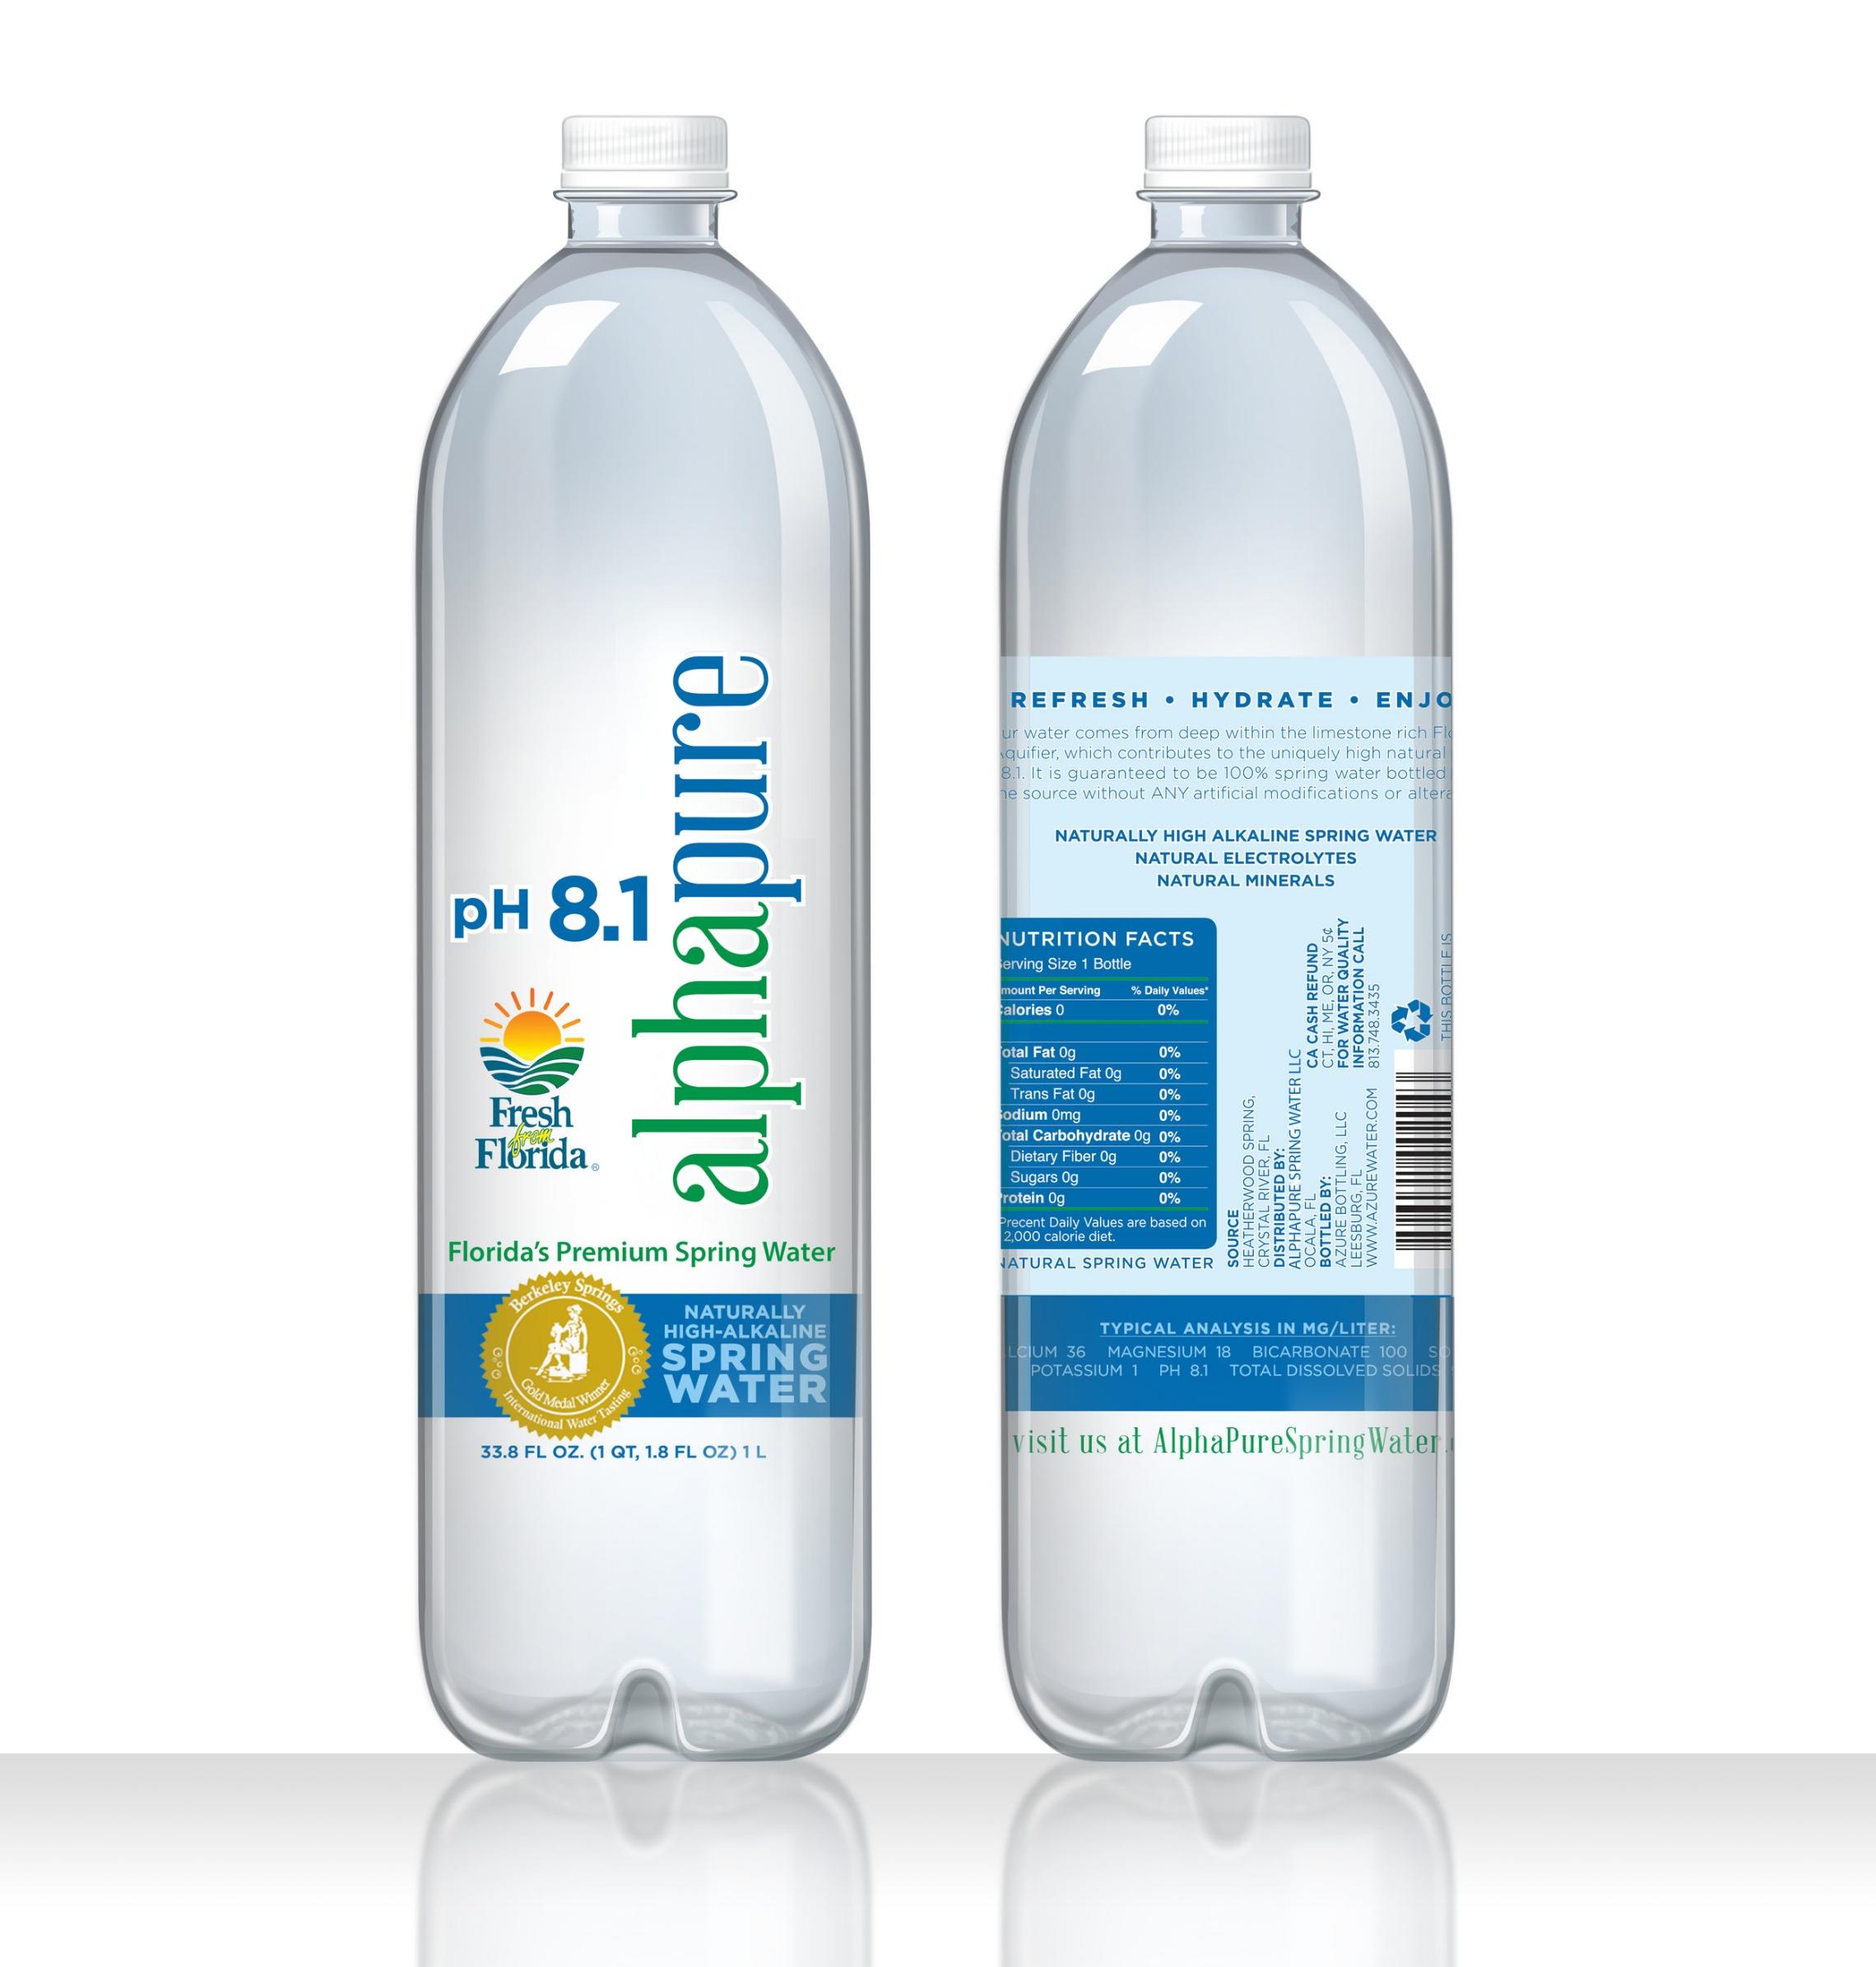 AlphaPure_bottle_1L_new_F.jpg